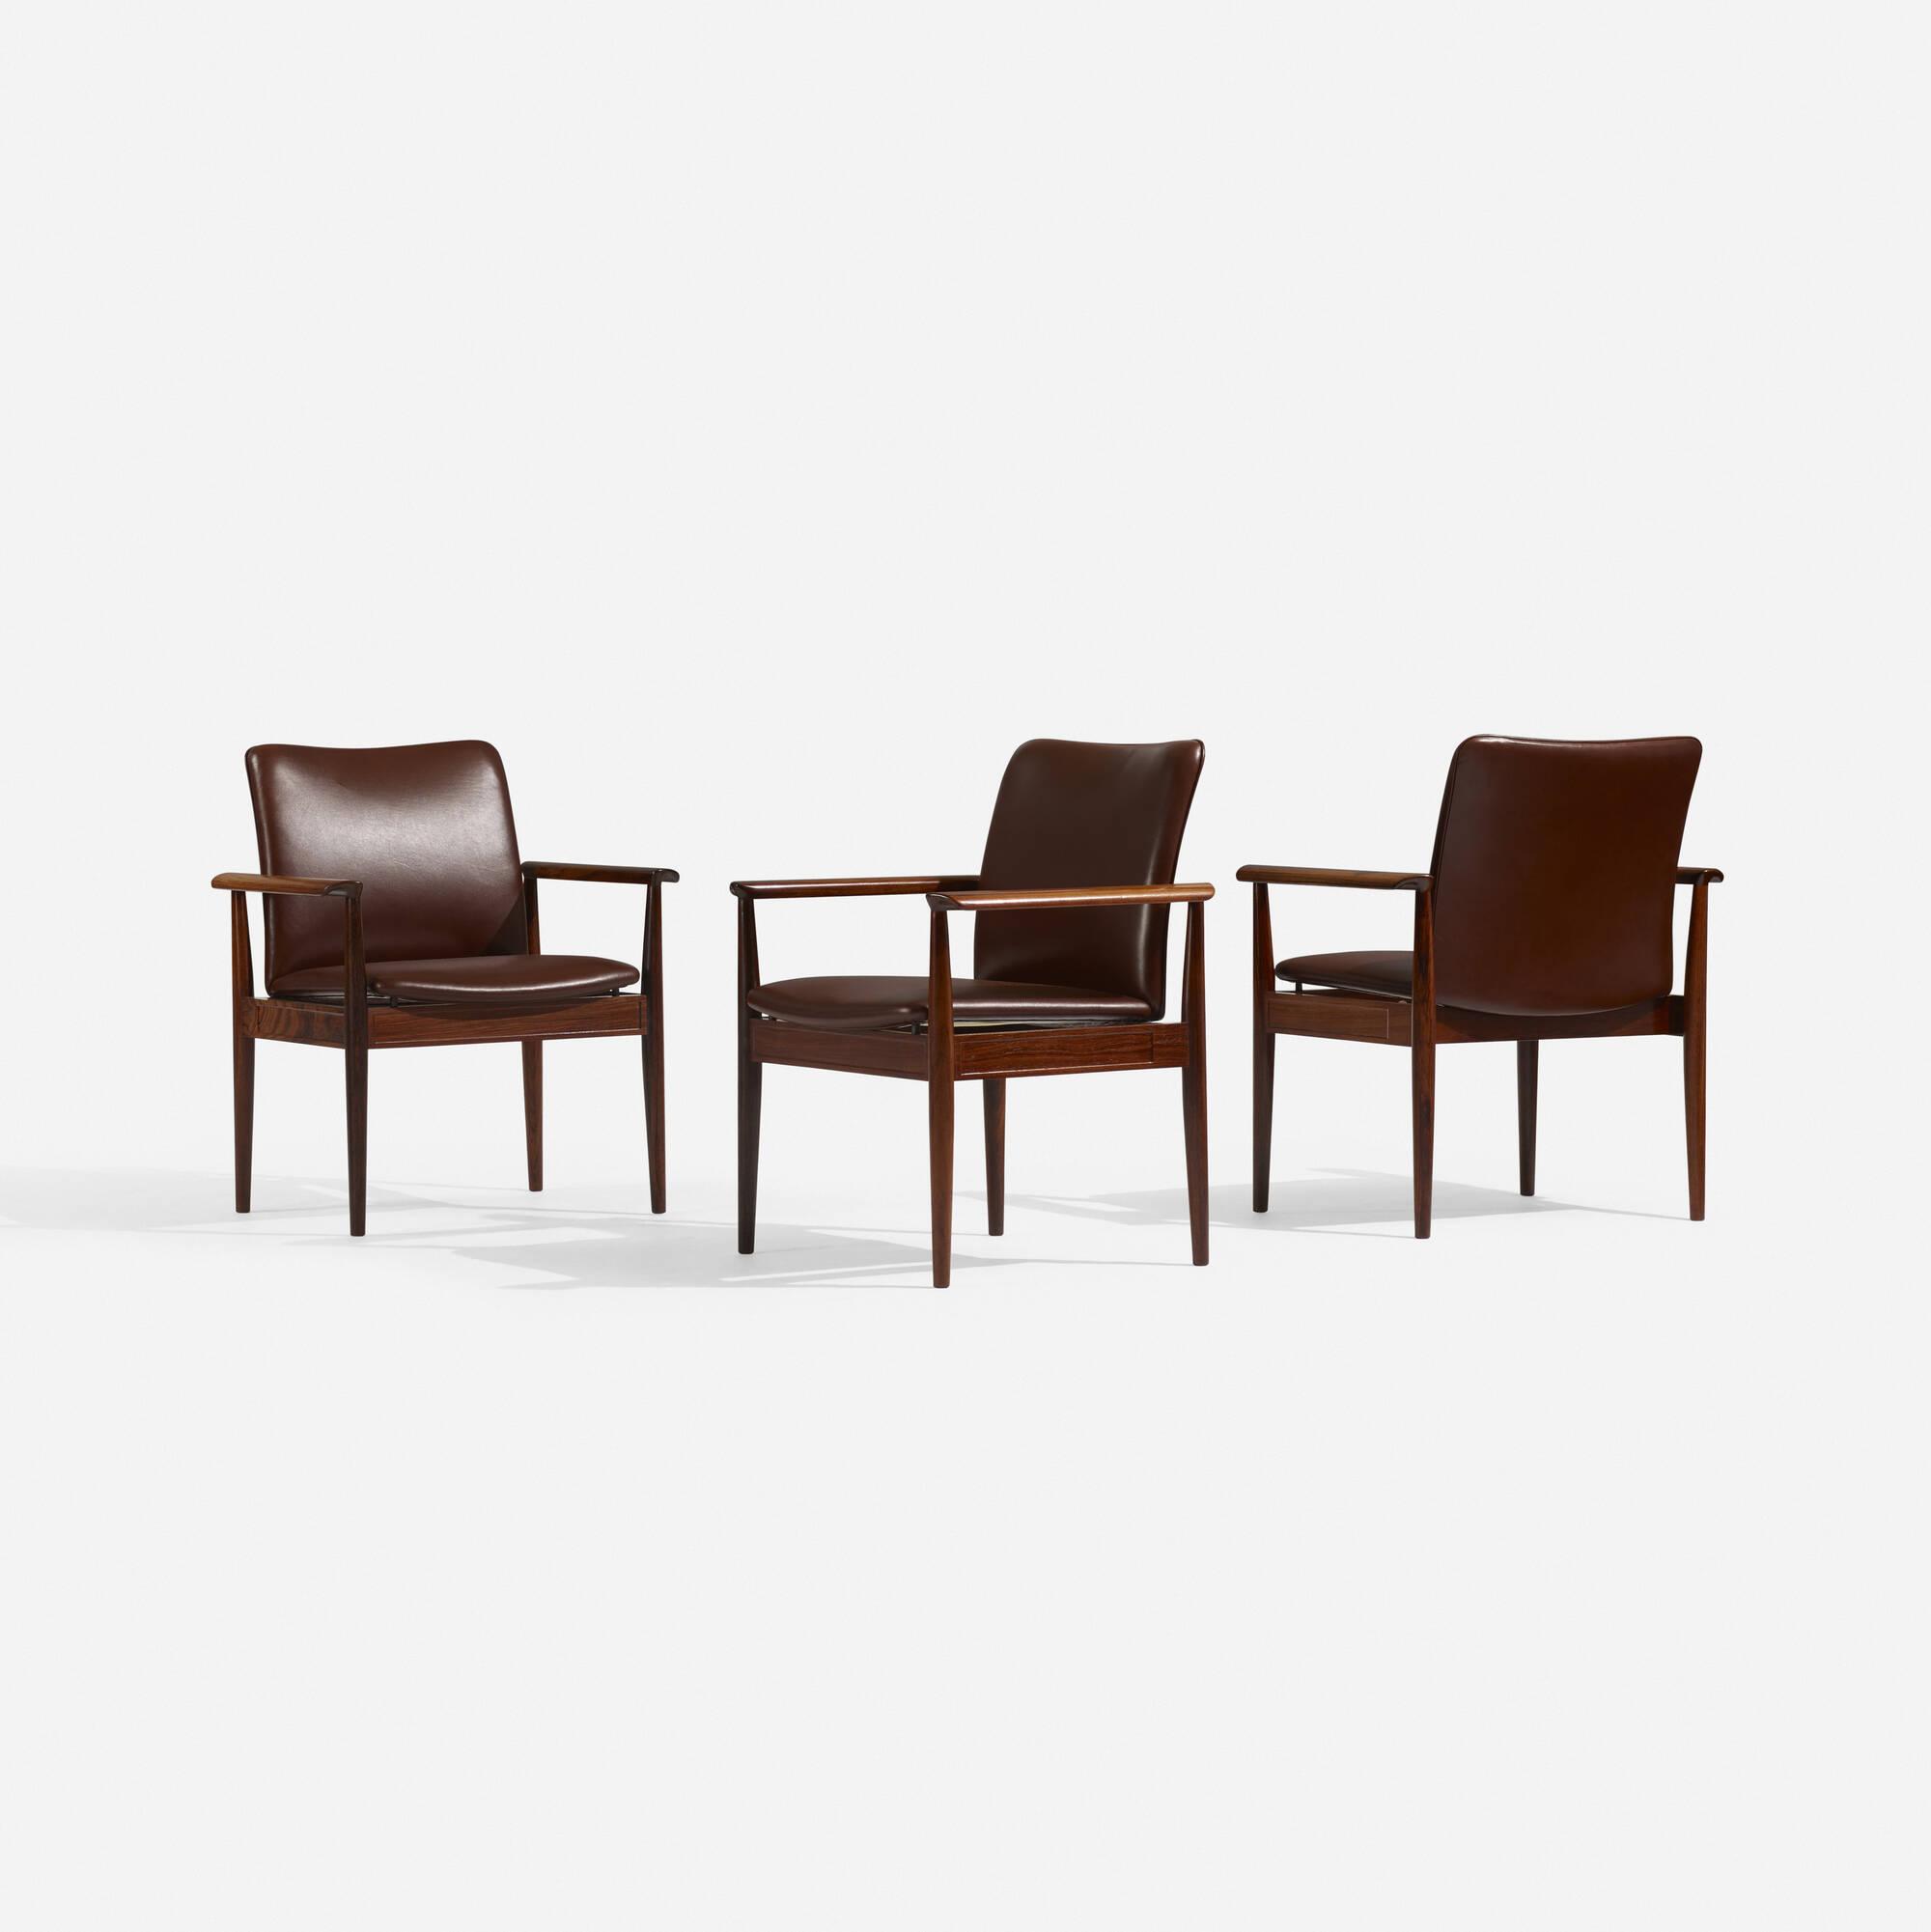 102: Finn Juhl / Diplomat armchairs, set of six (3 of 3)